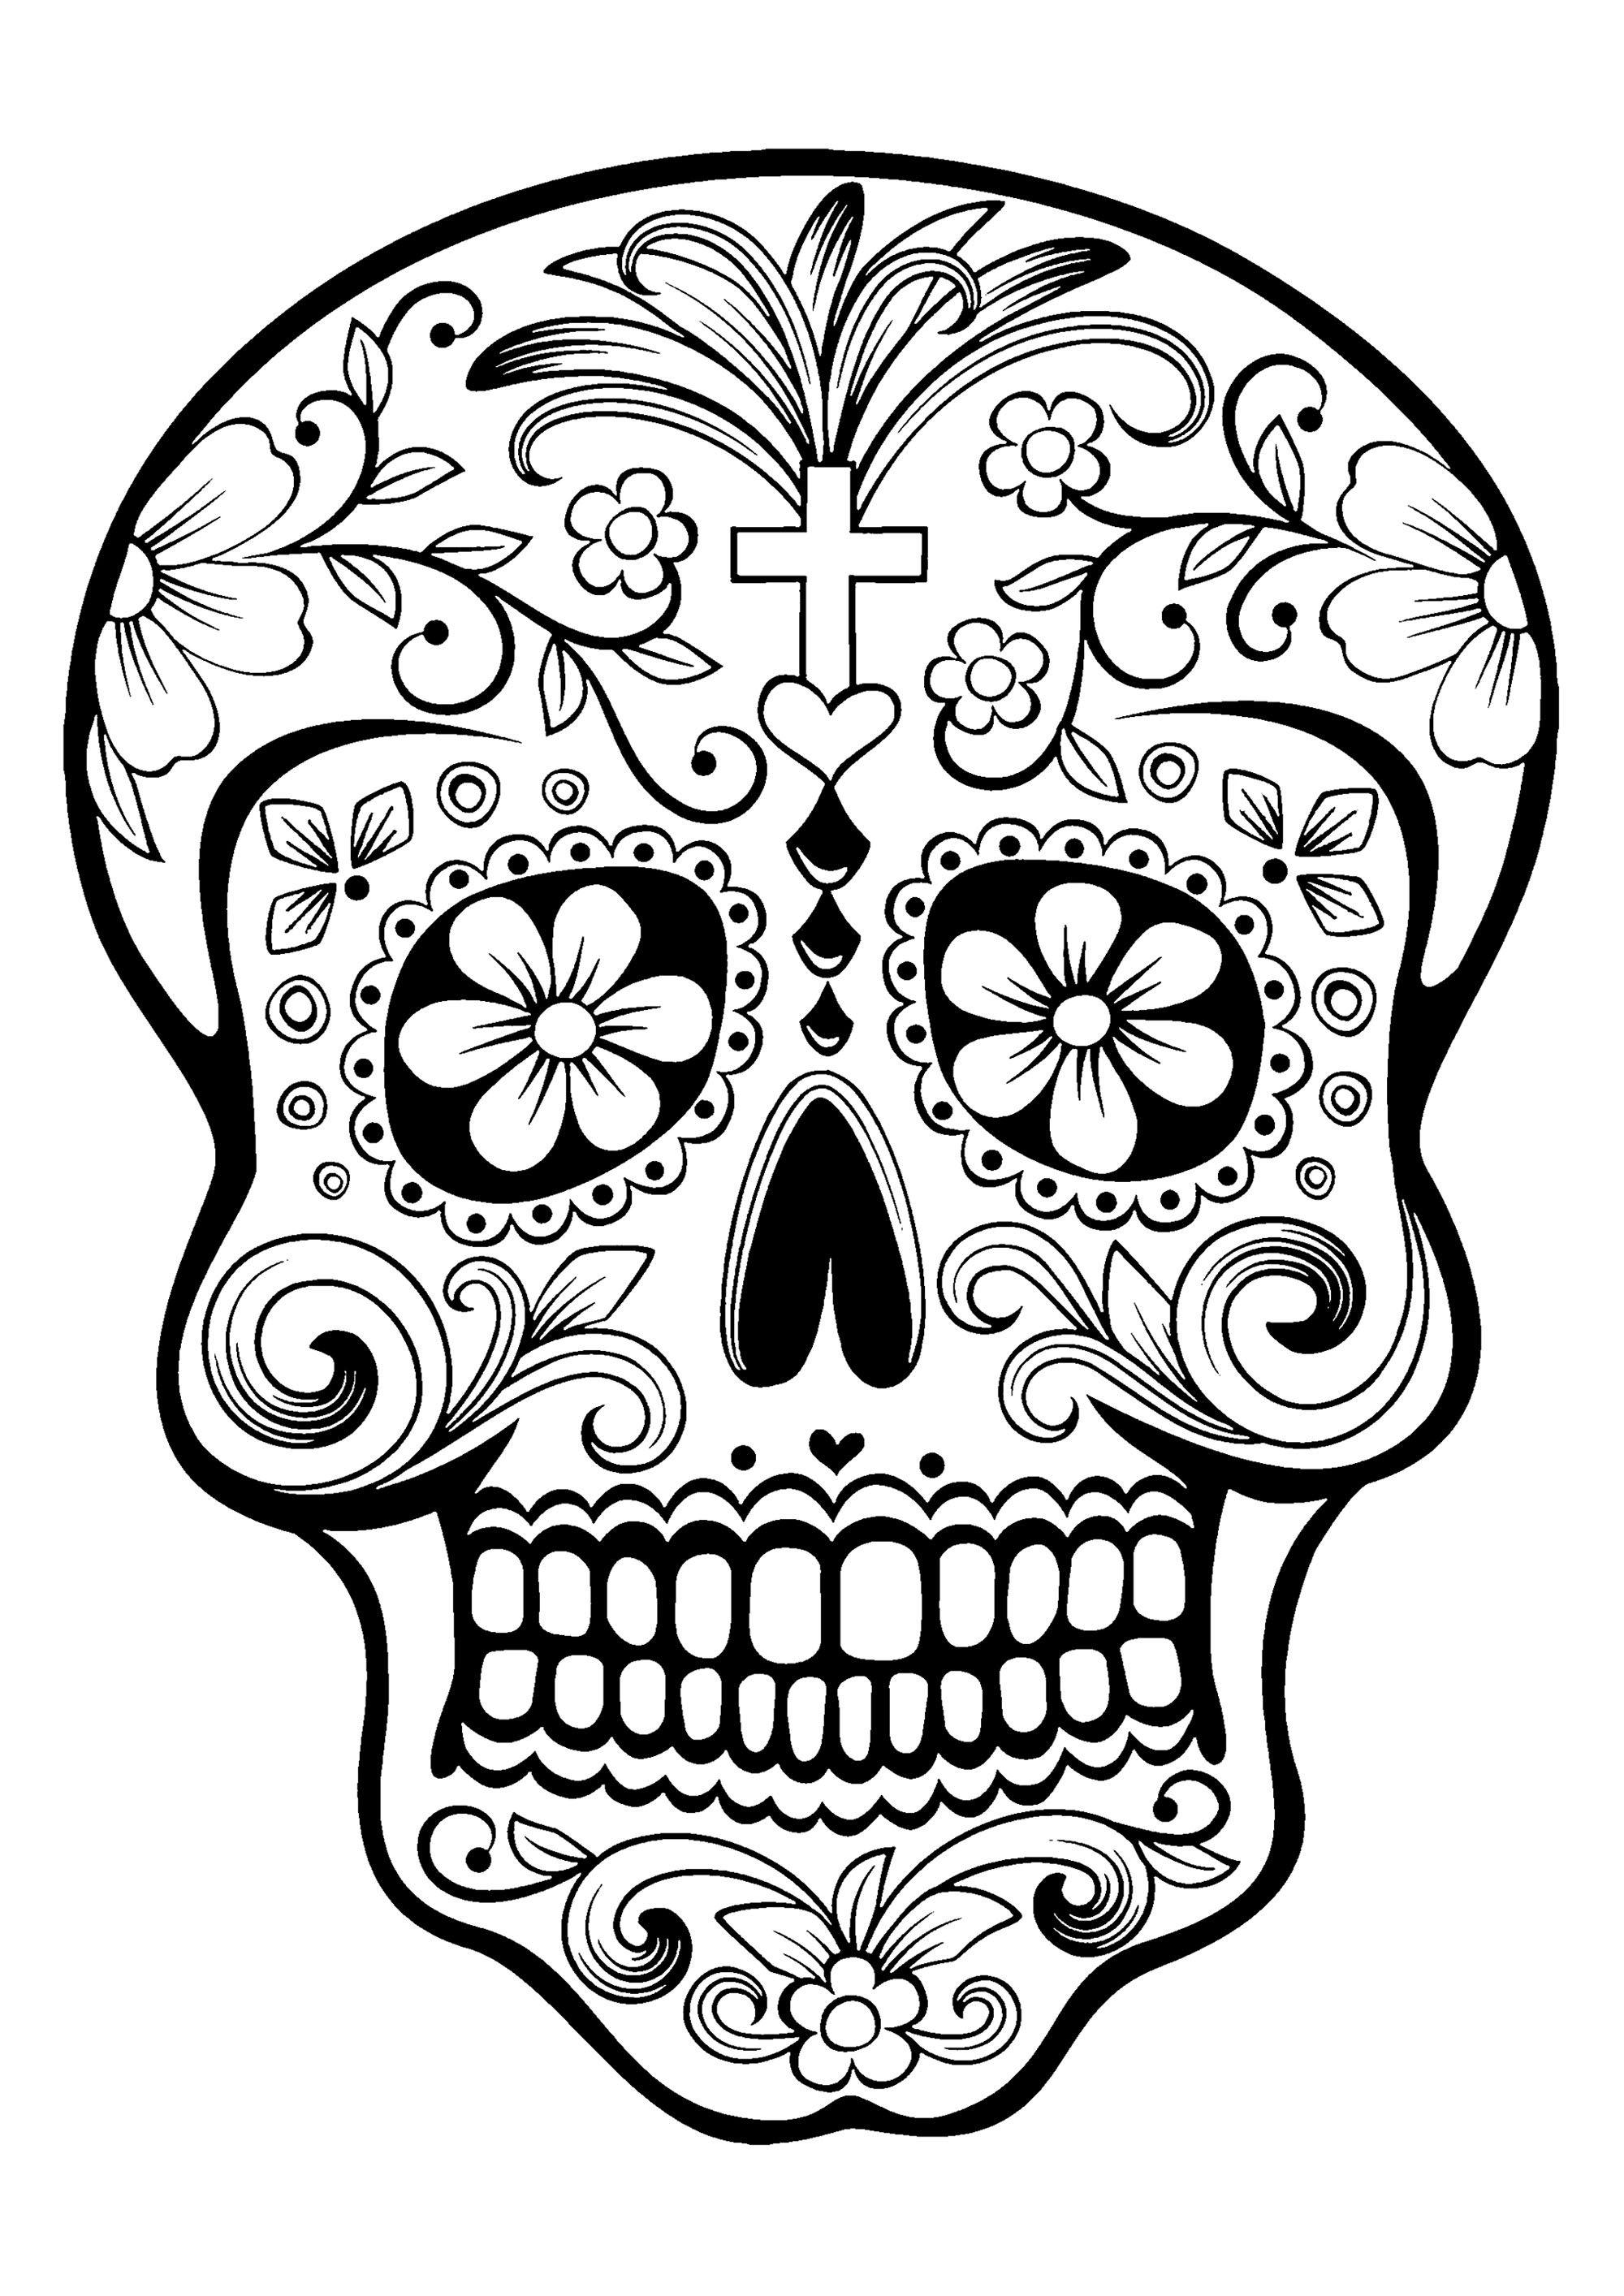 El dia de los muertos 1 El Dia de los Muertos Coloring